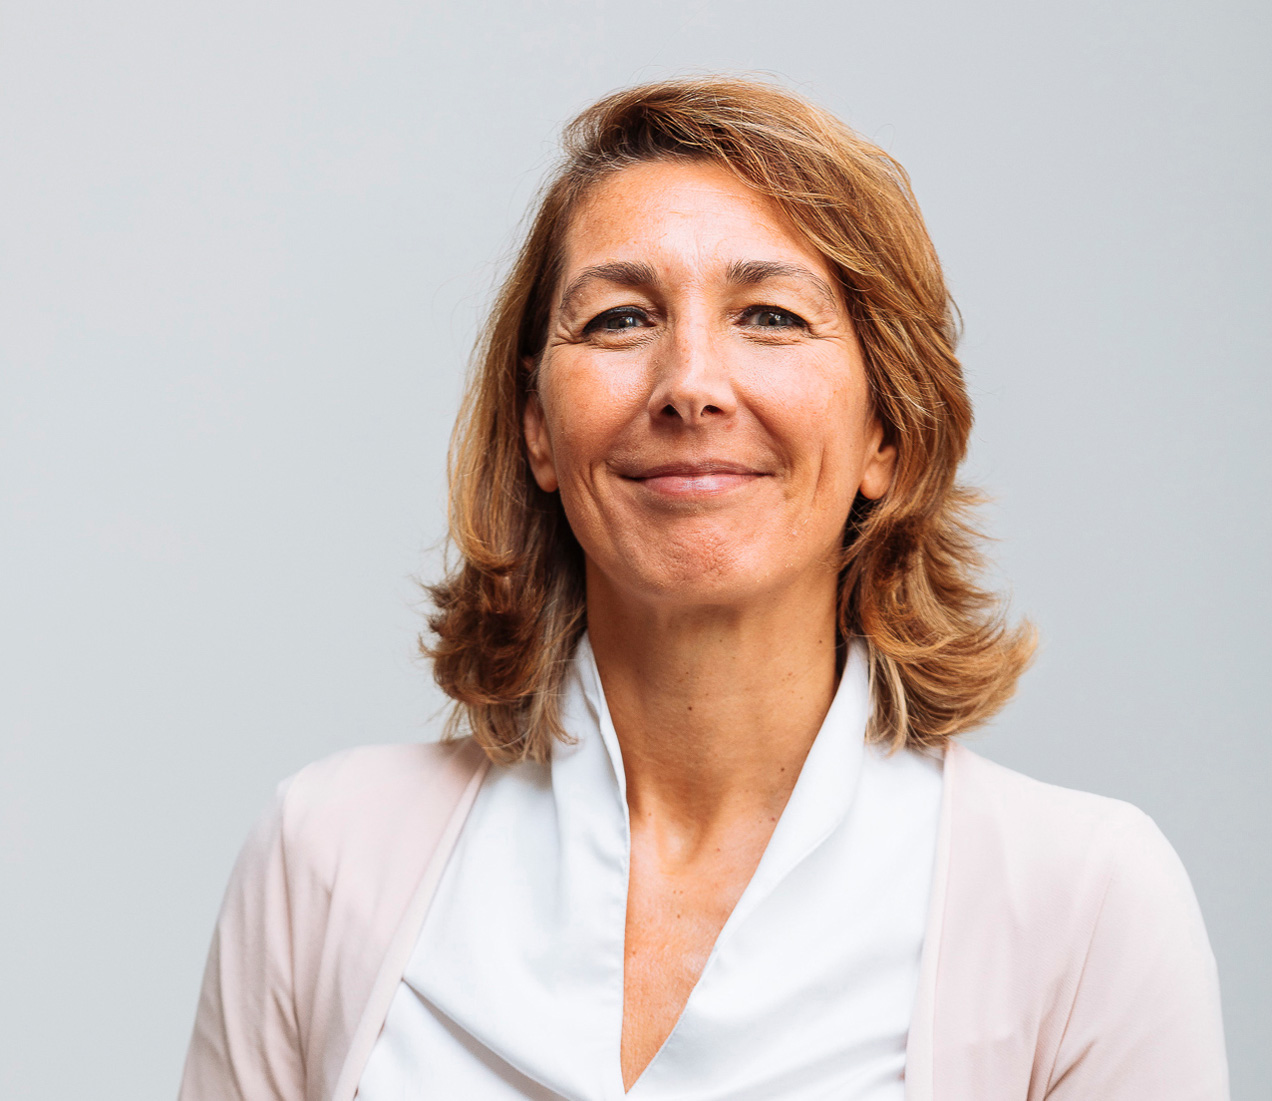 Barbara Cavalieri